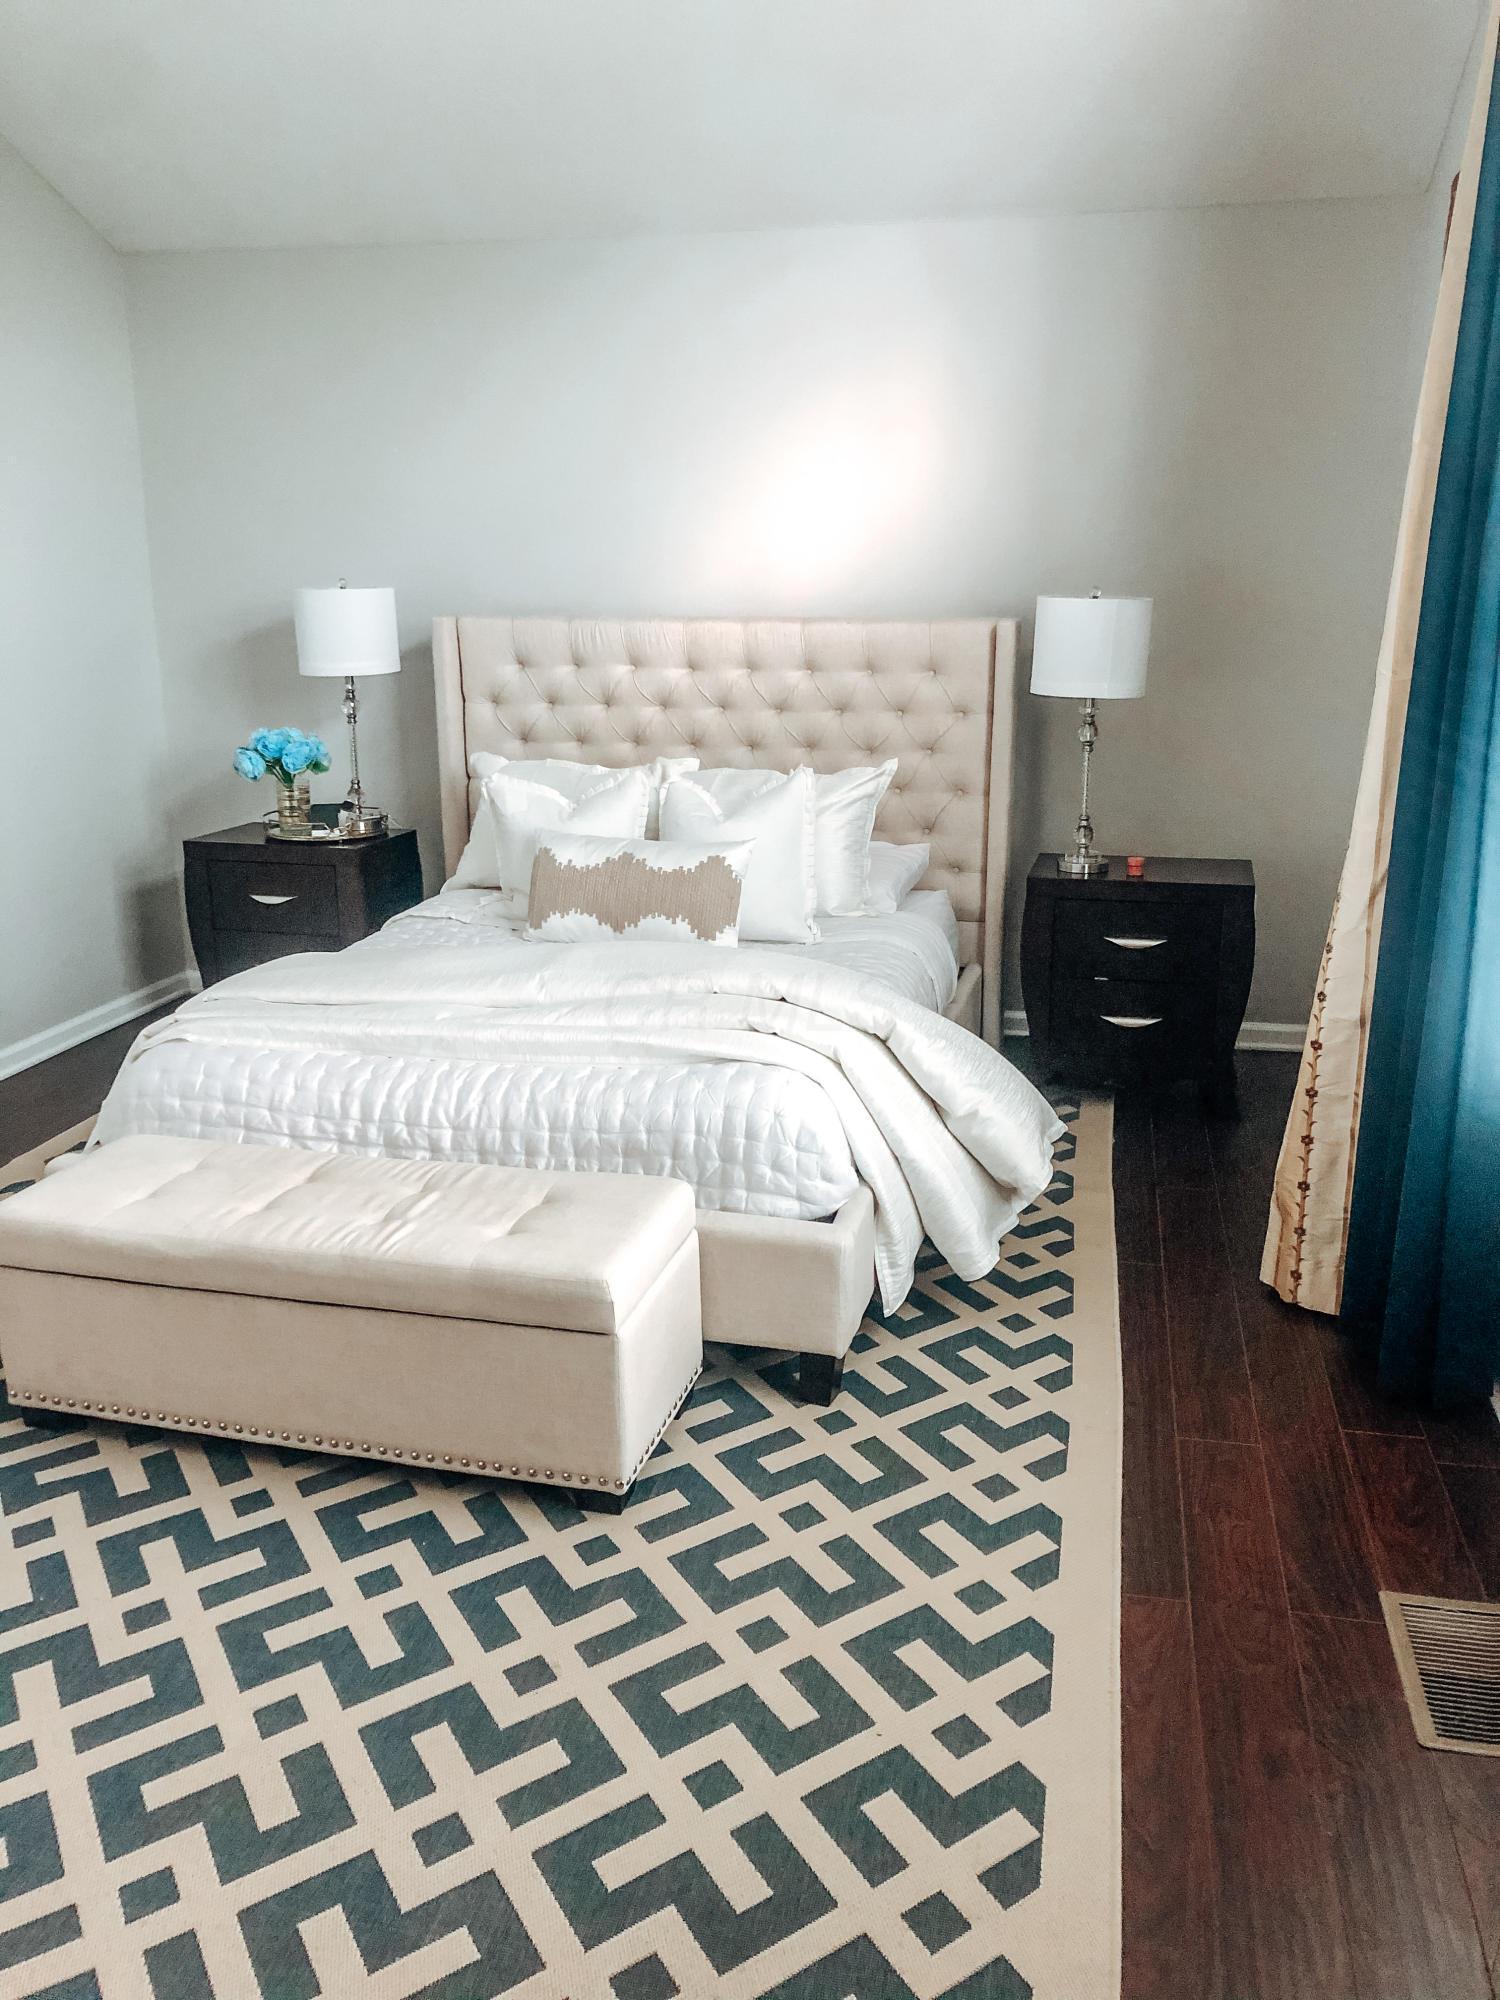 7805 Essex Gate Drive, Dublin, Ohio 43016, 2 Bedrooms Bedrooms, ,3 BathroomsBathrooms,Residential,For Sale,Essex Gate,220023392